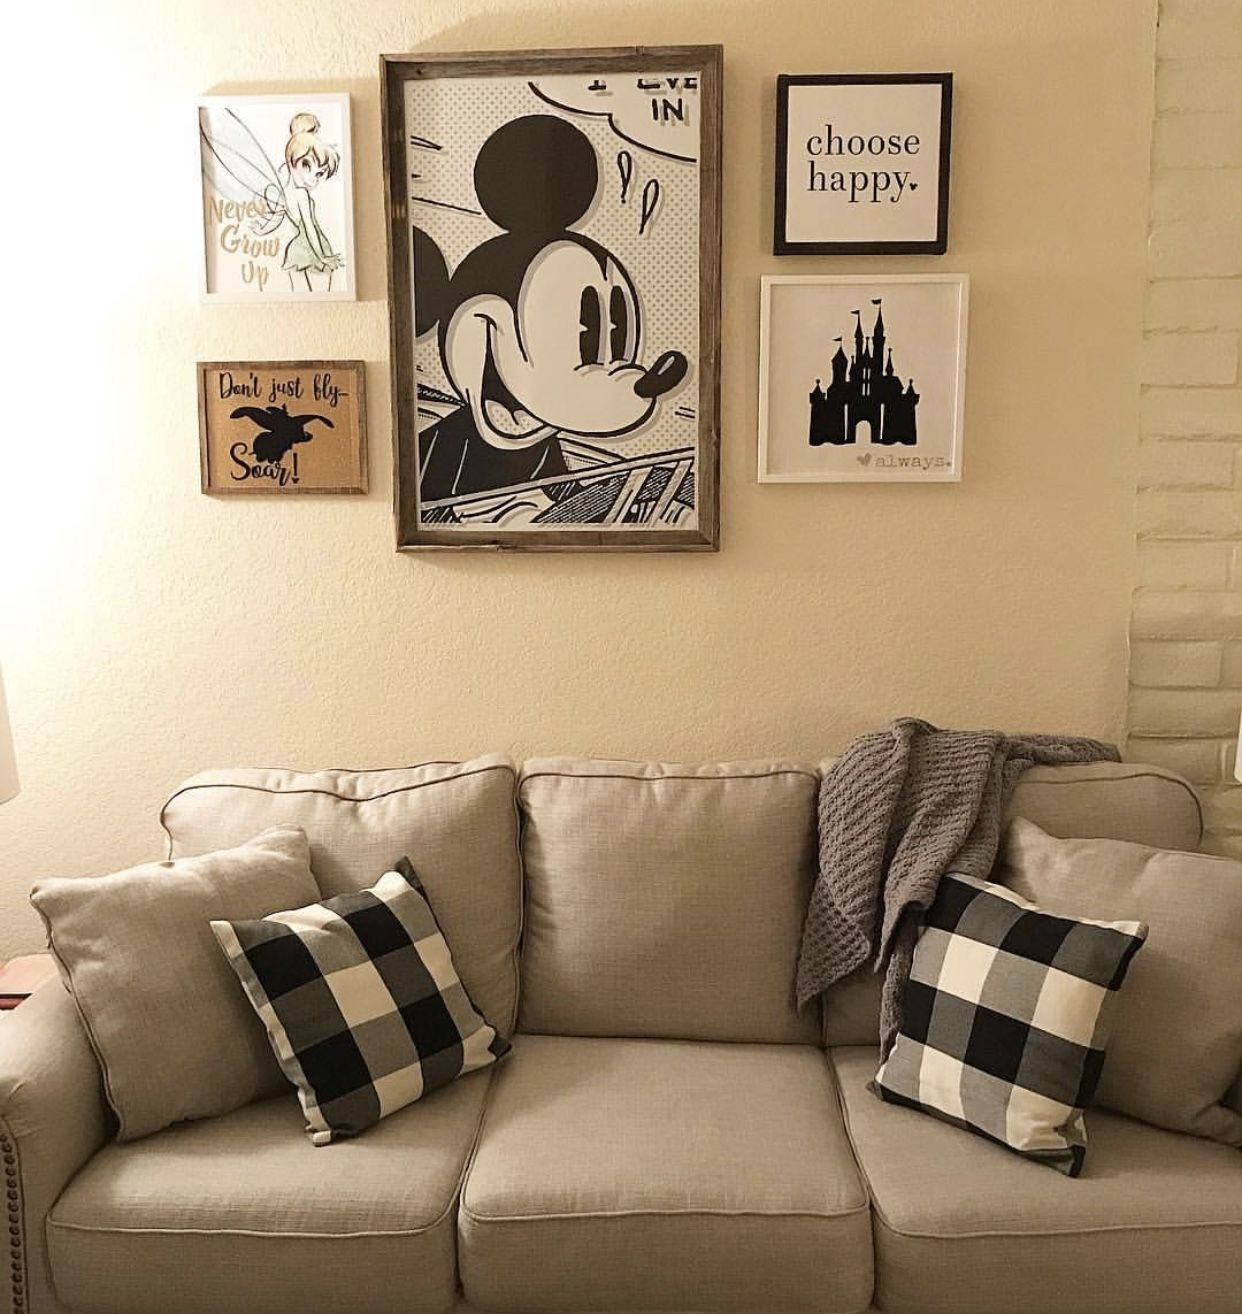 Pin By Rachel Terkowski On Future House Disney Home Decor Disney House Ideas Disney Room Decor